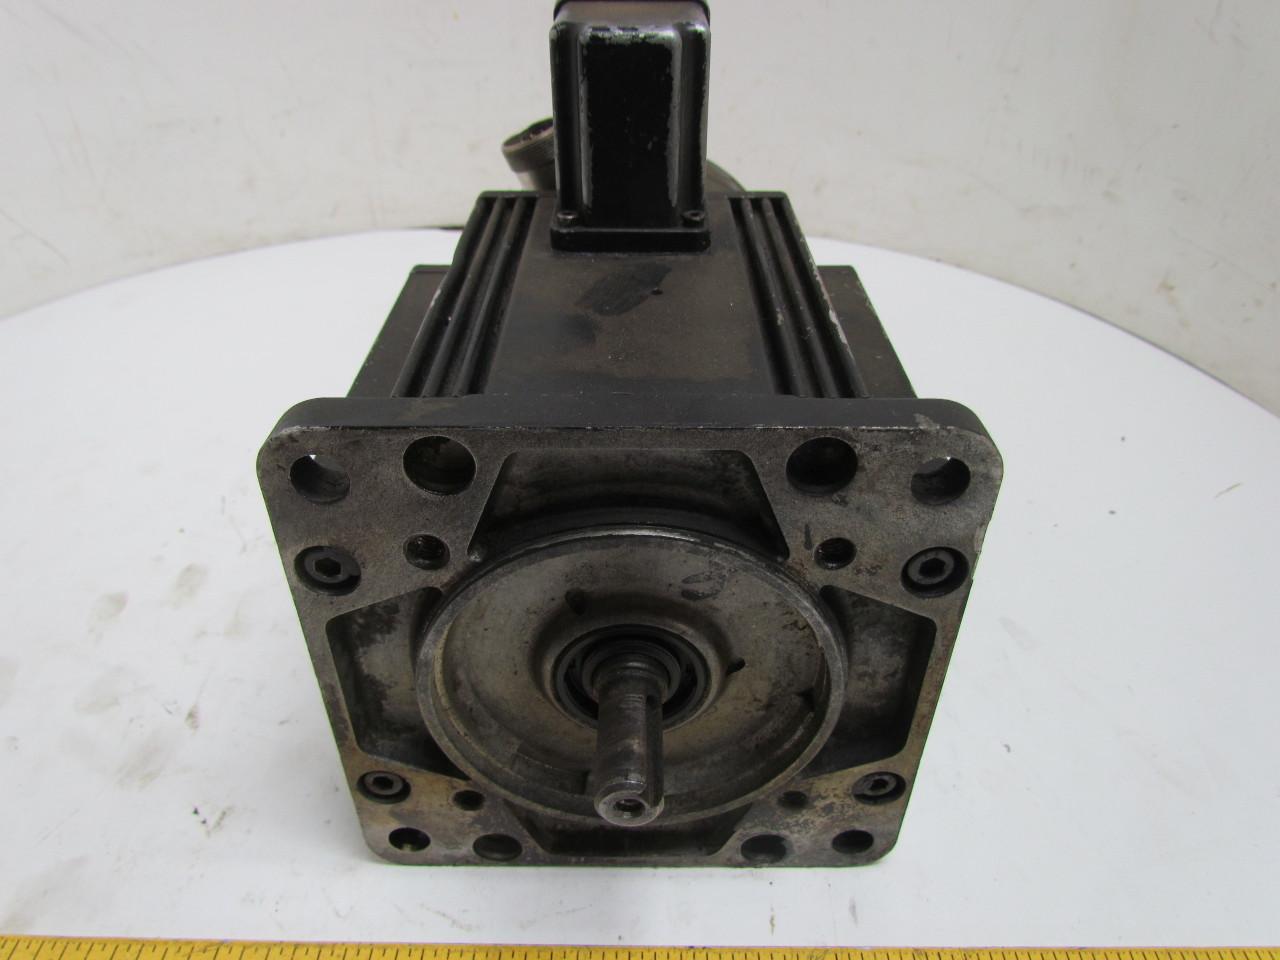 Indramat MAC 92A 0 DD 2 C 95 B 0 S01 Permanent Magnet